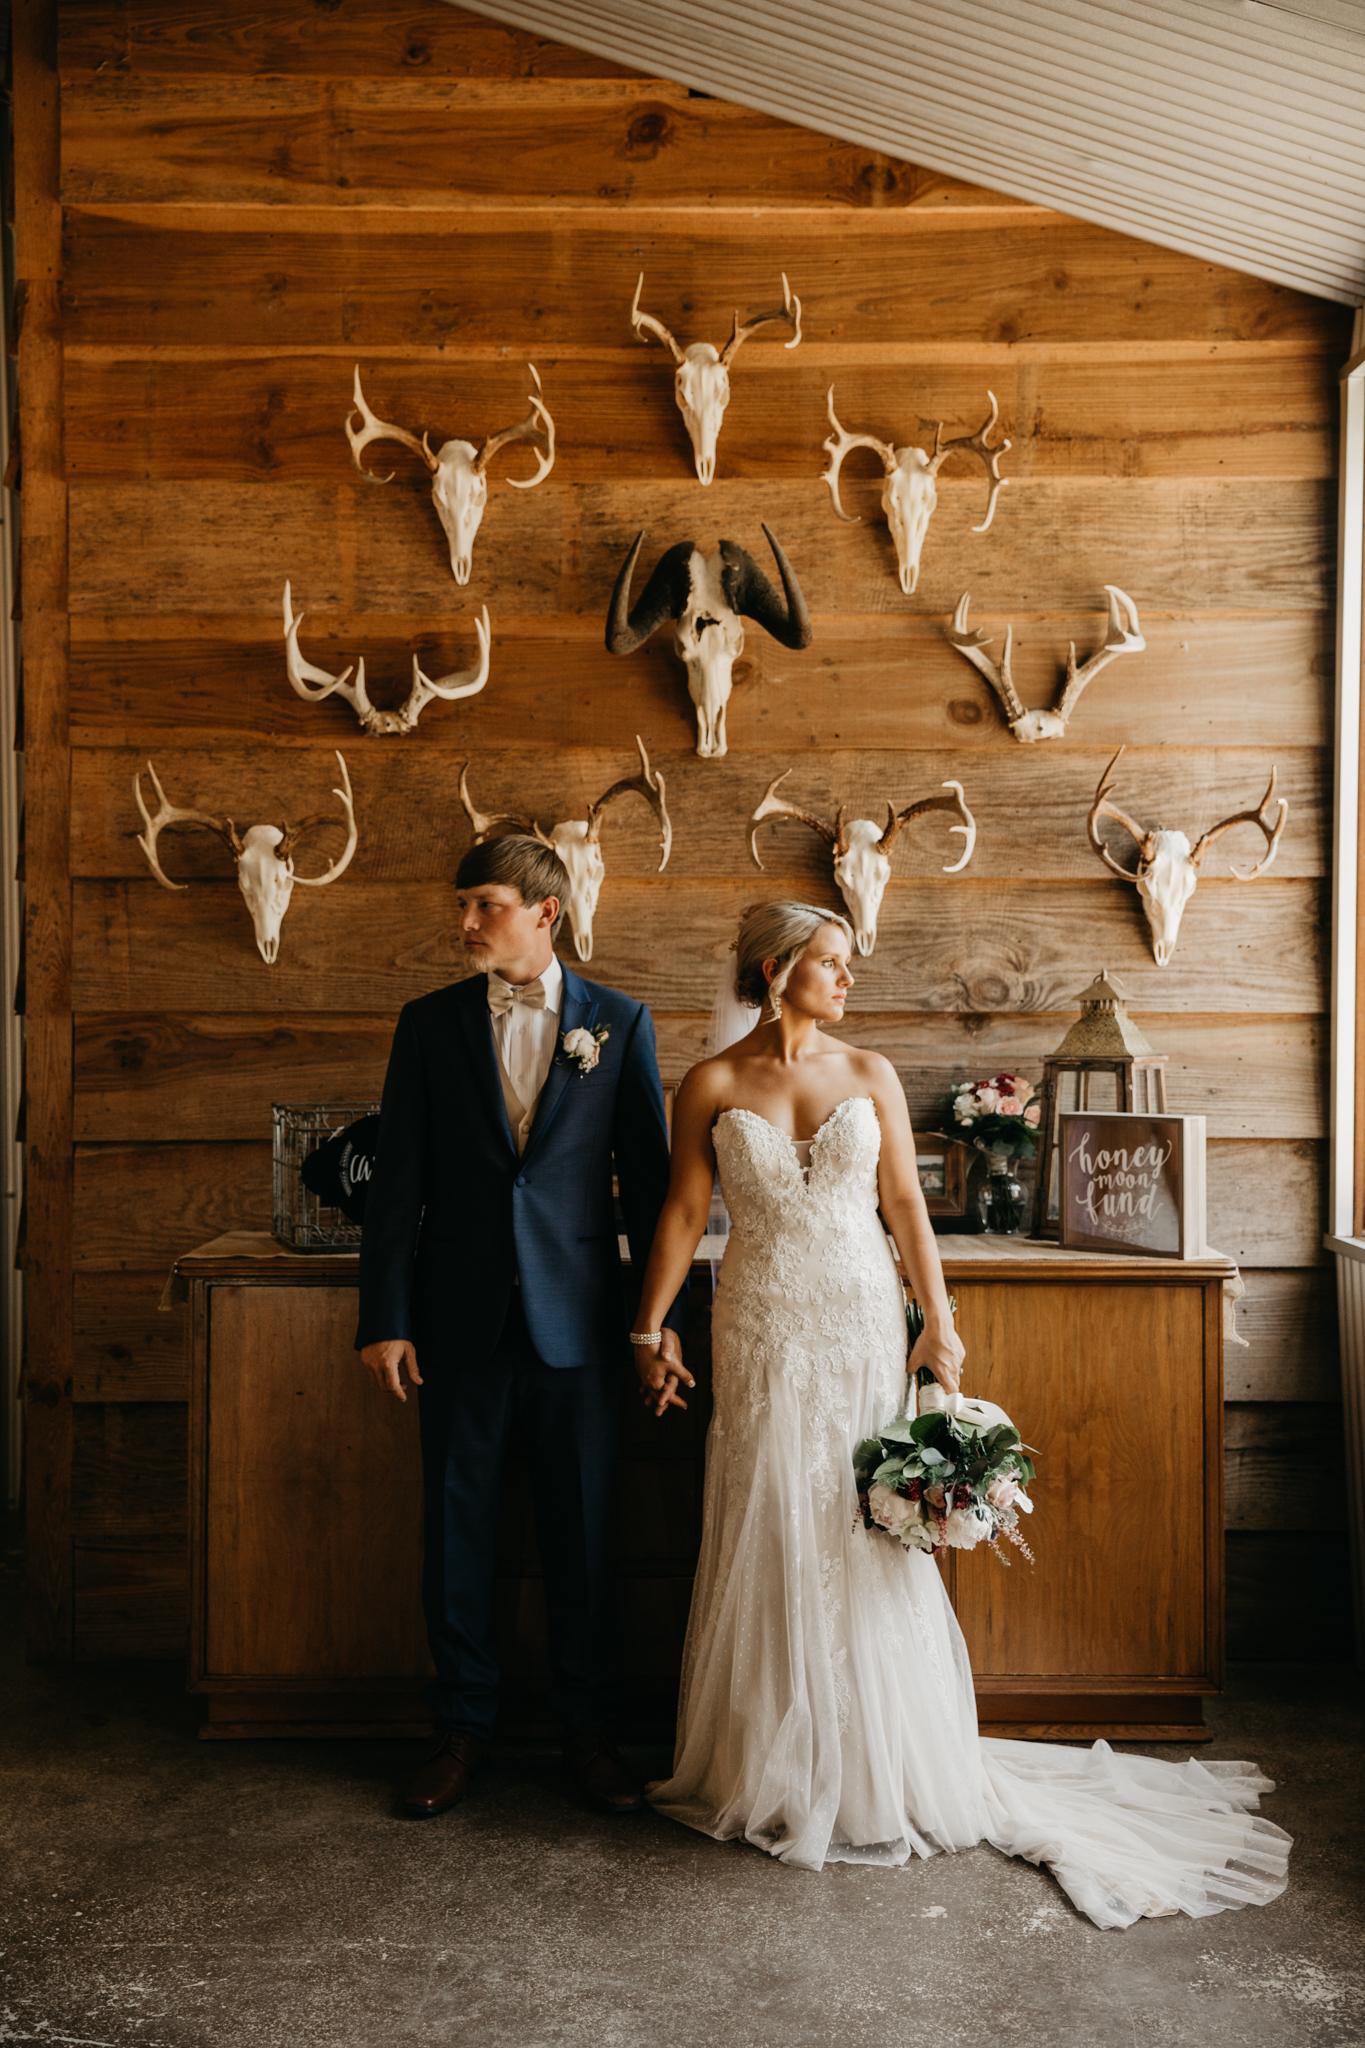 MonicaLeavell-Macon-Georgia-Intimate-Wedding-Photographer-1.jpg